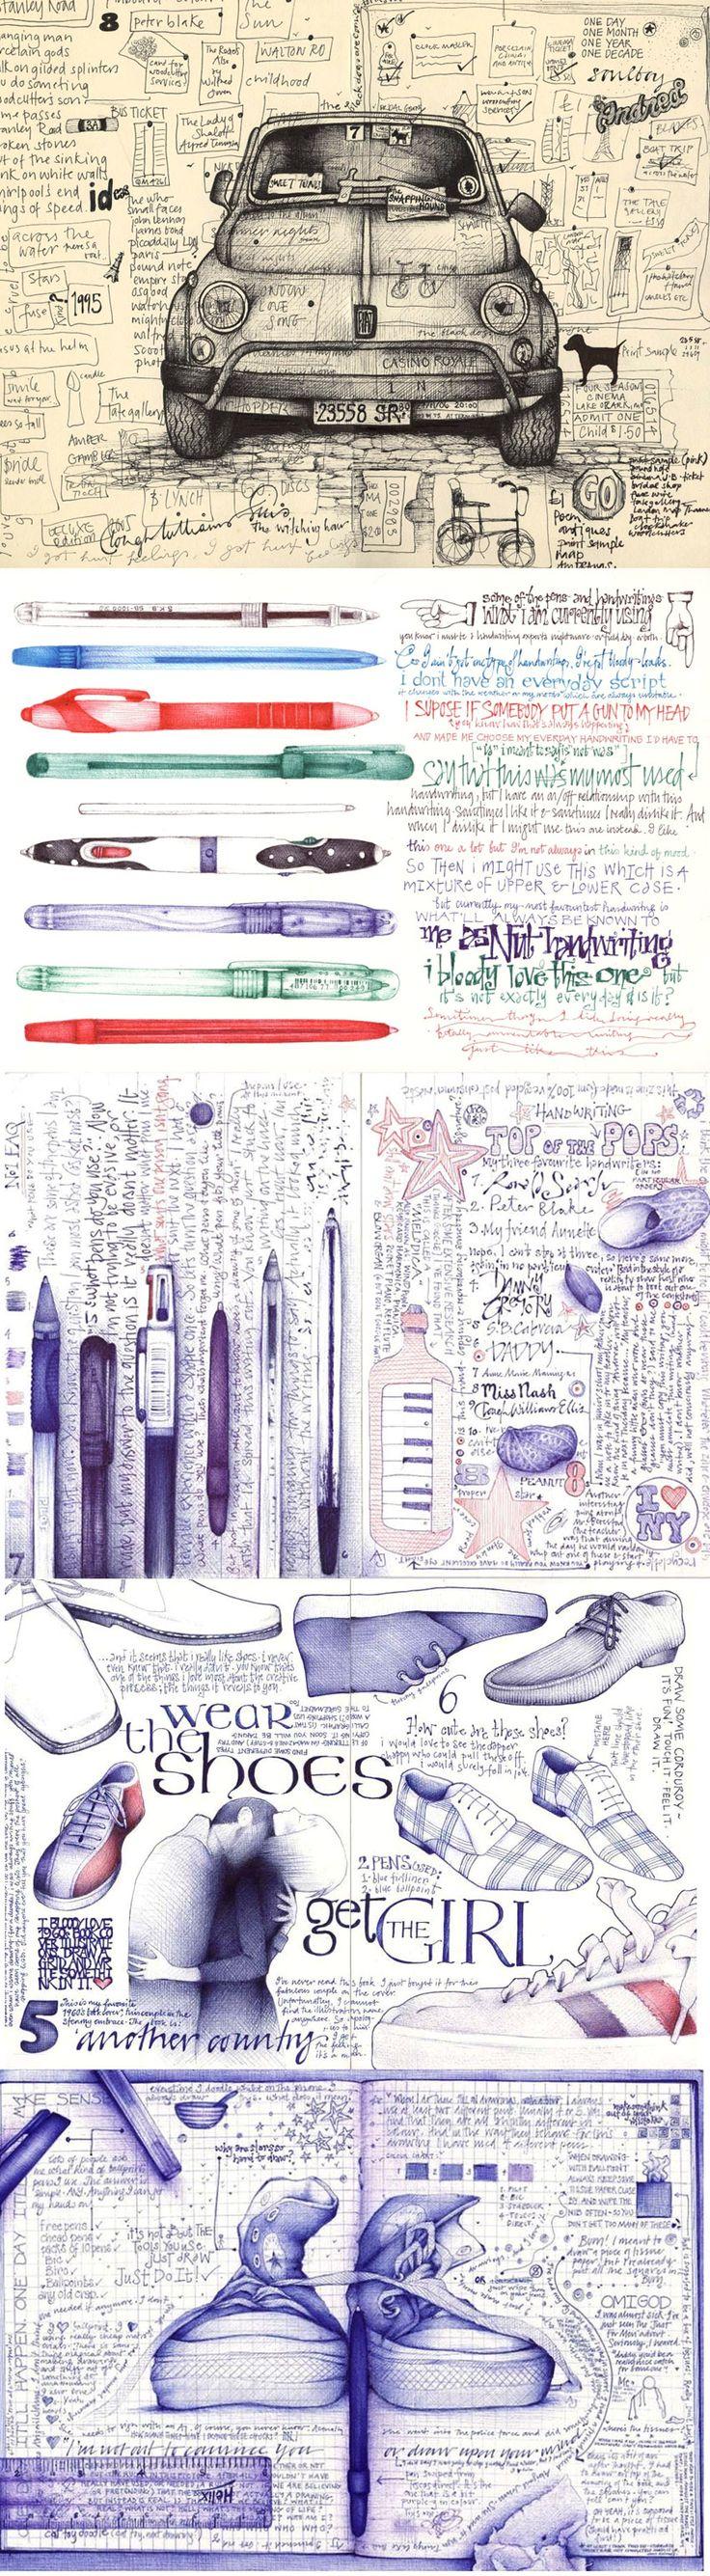 Art of Sketchezzz... Andrea Joseph http://andreajoseph24.blogspot.ca/ @AndreaJoseph #Sketch #Creative #SketchPad